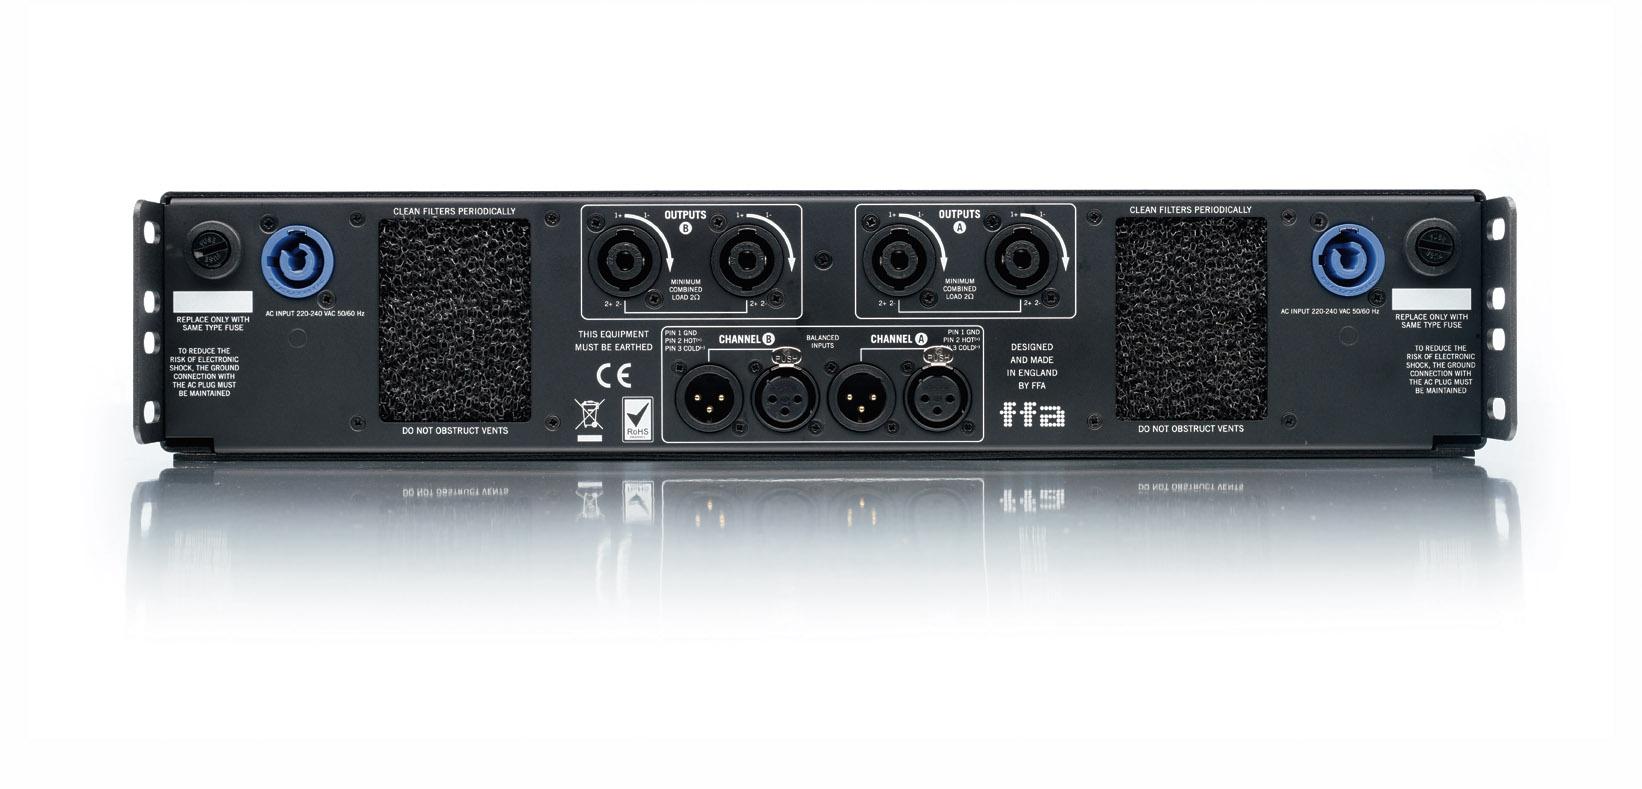 Ffa 8000 Dual Power 2 X 4000w 8 Ohm Pa Speaker Wiring Diagram Product Image